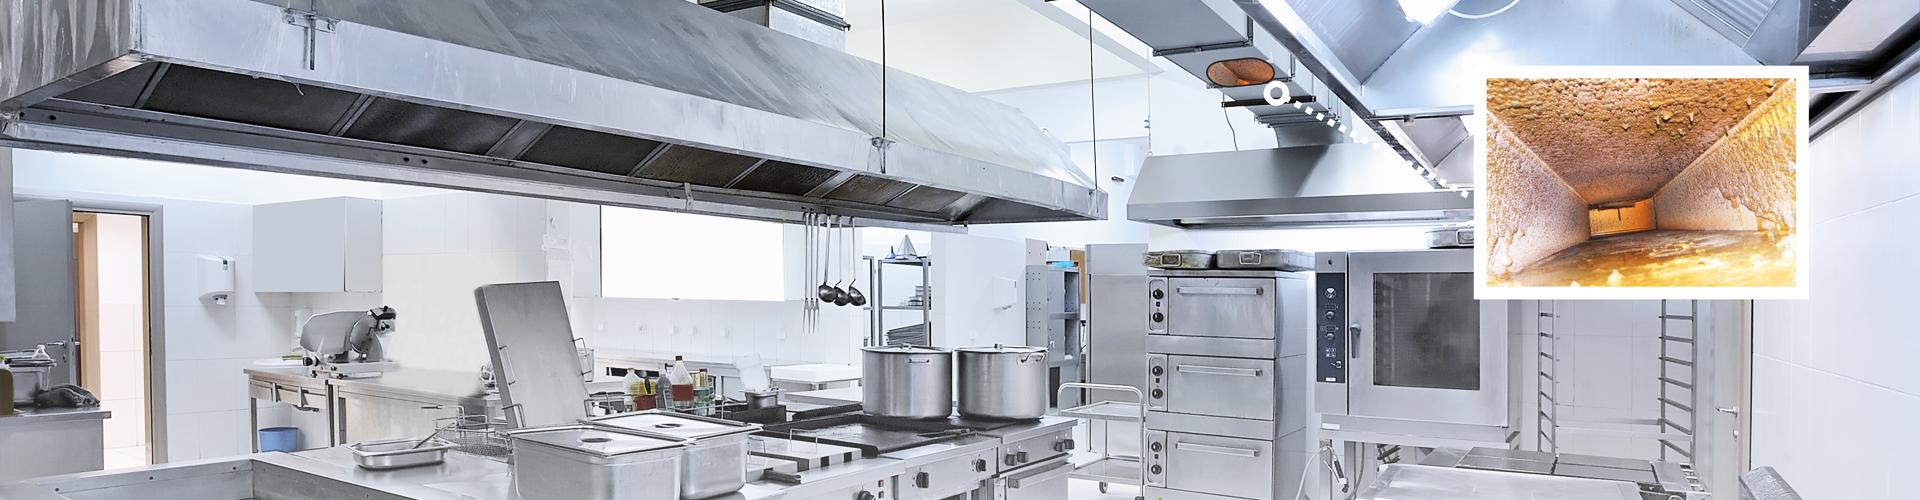 Kitchen exhaust cleaning equipment